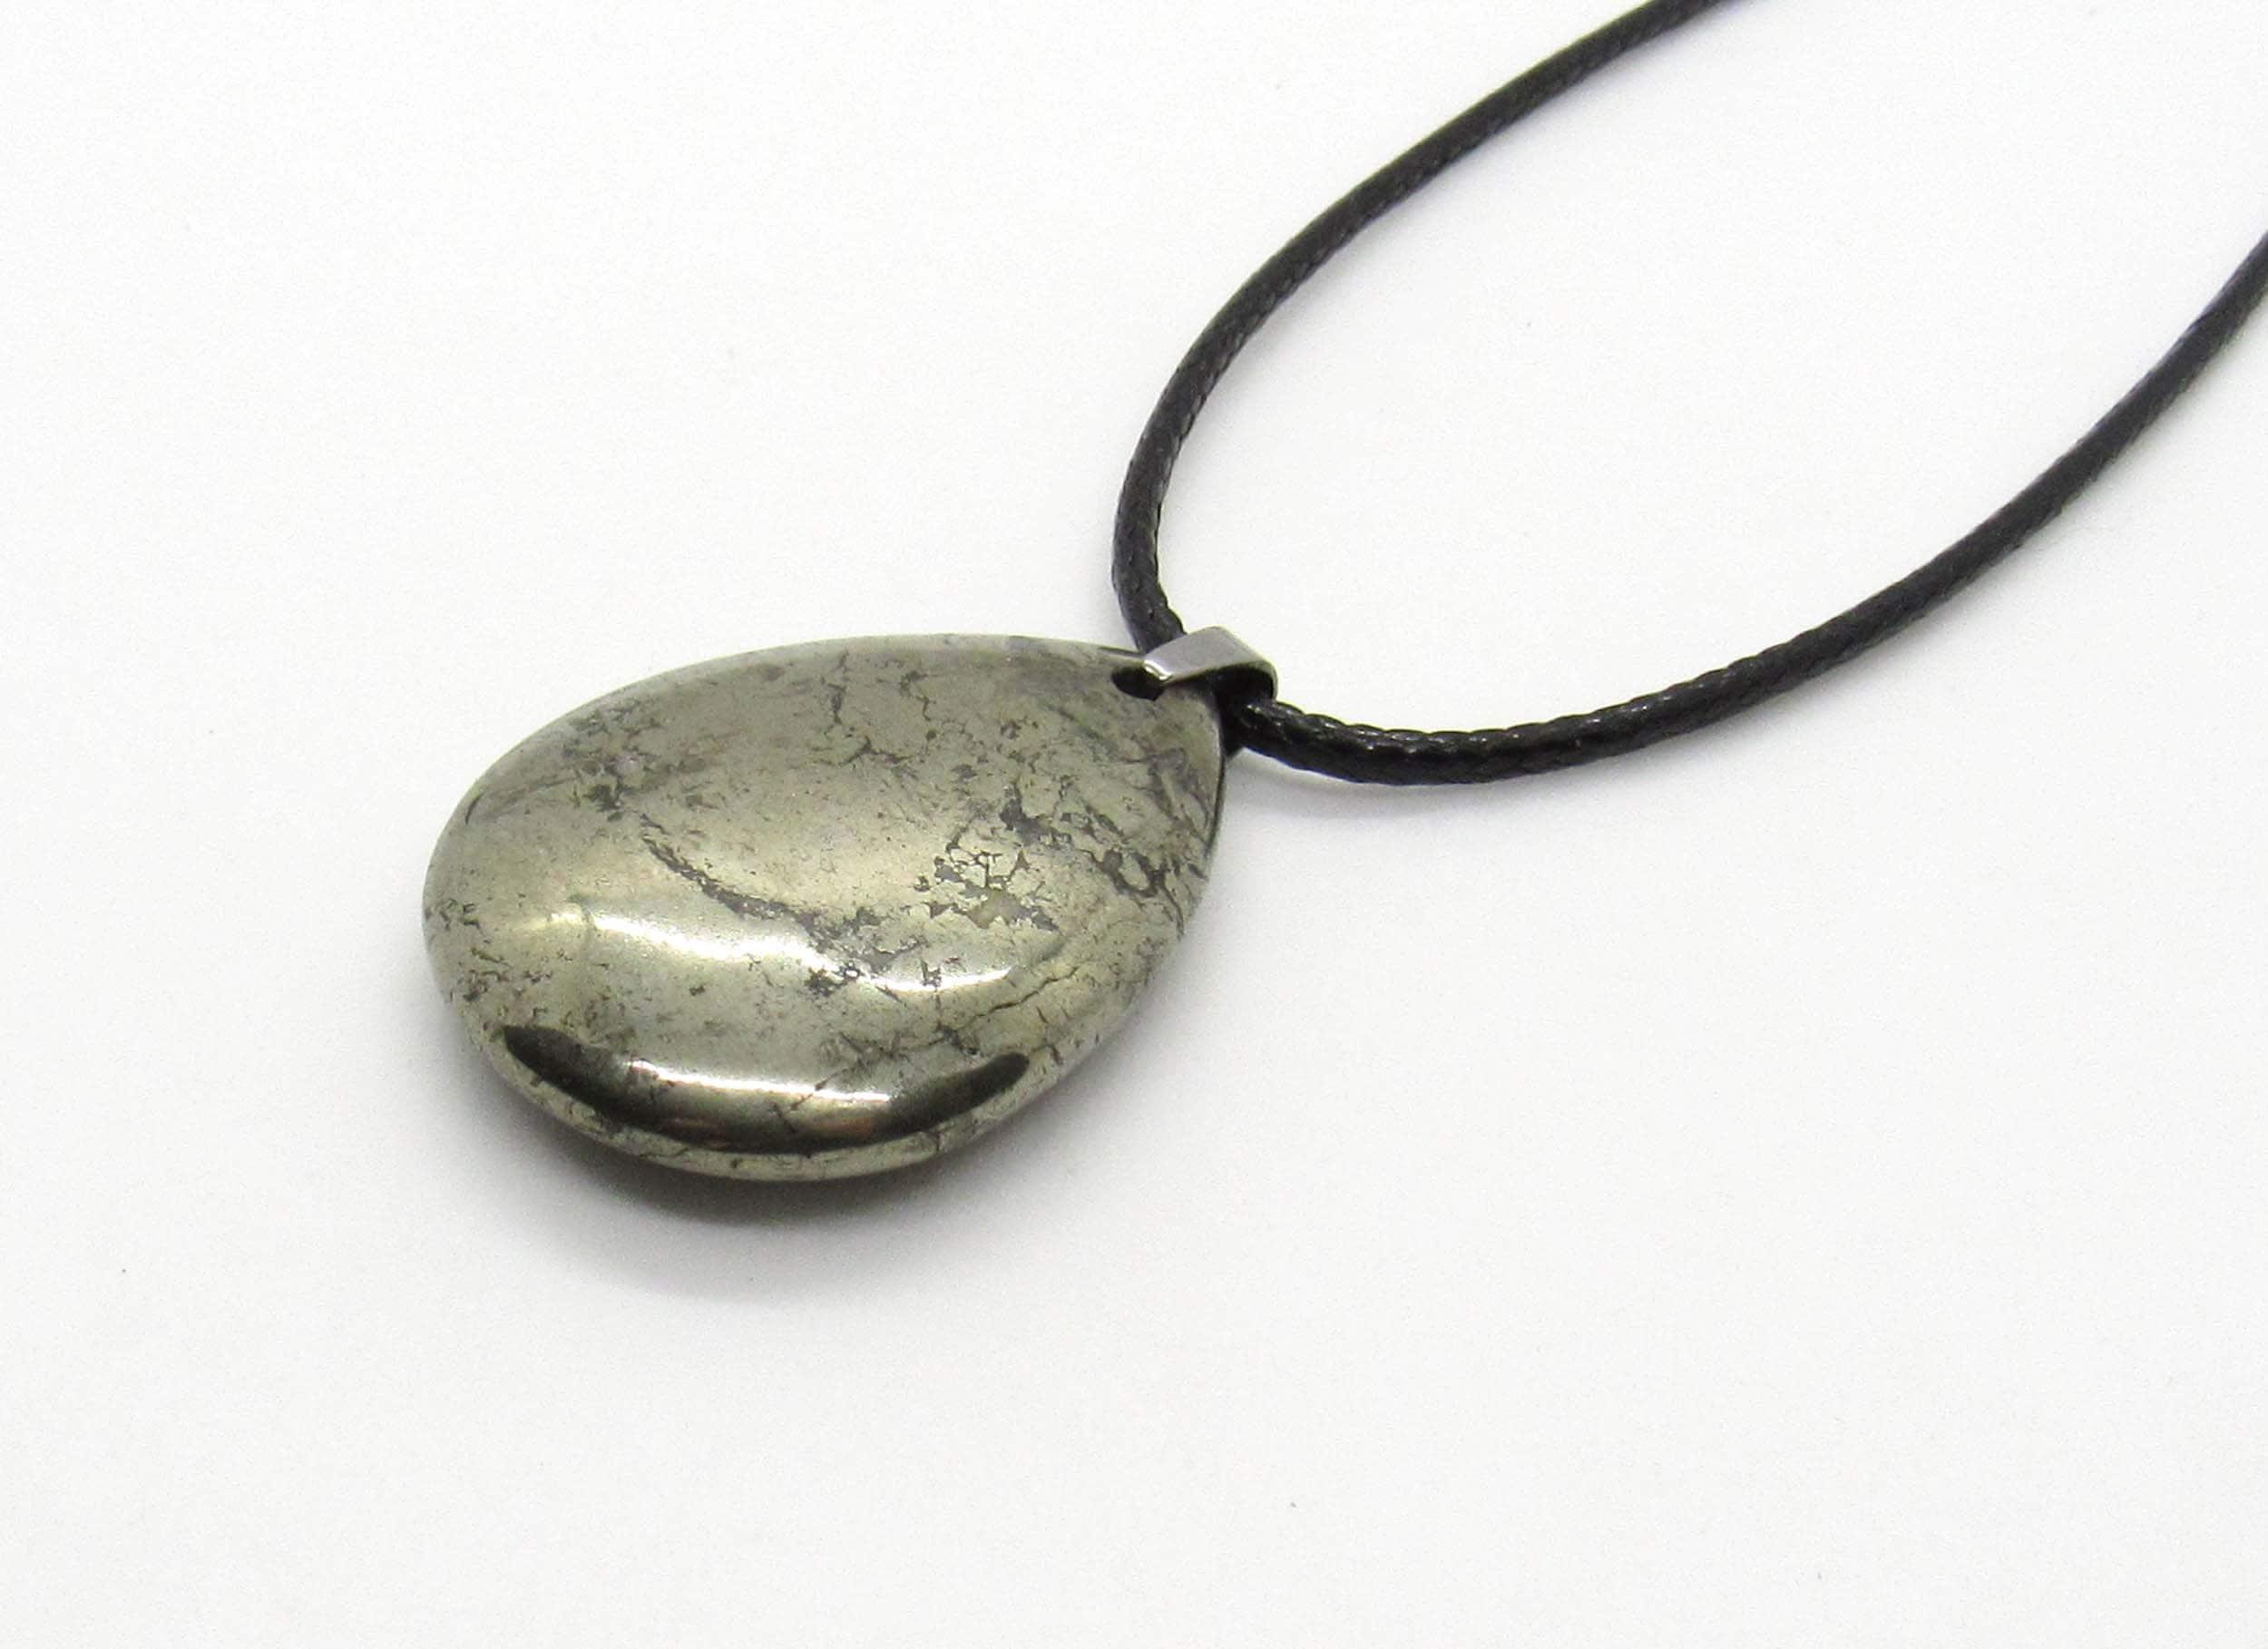 Men/'s Jewelry Pyrite Crystal Healing Pendant Necklace Men/'s Necklace Women/'s Necklace Stainless Steel Pyrite Drop Pendant Necklace